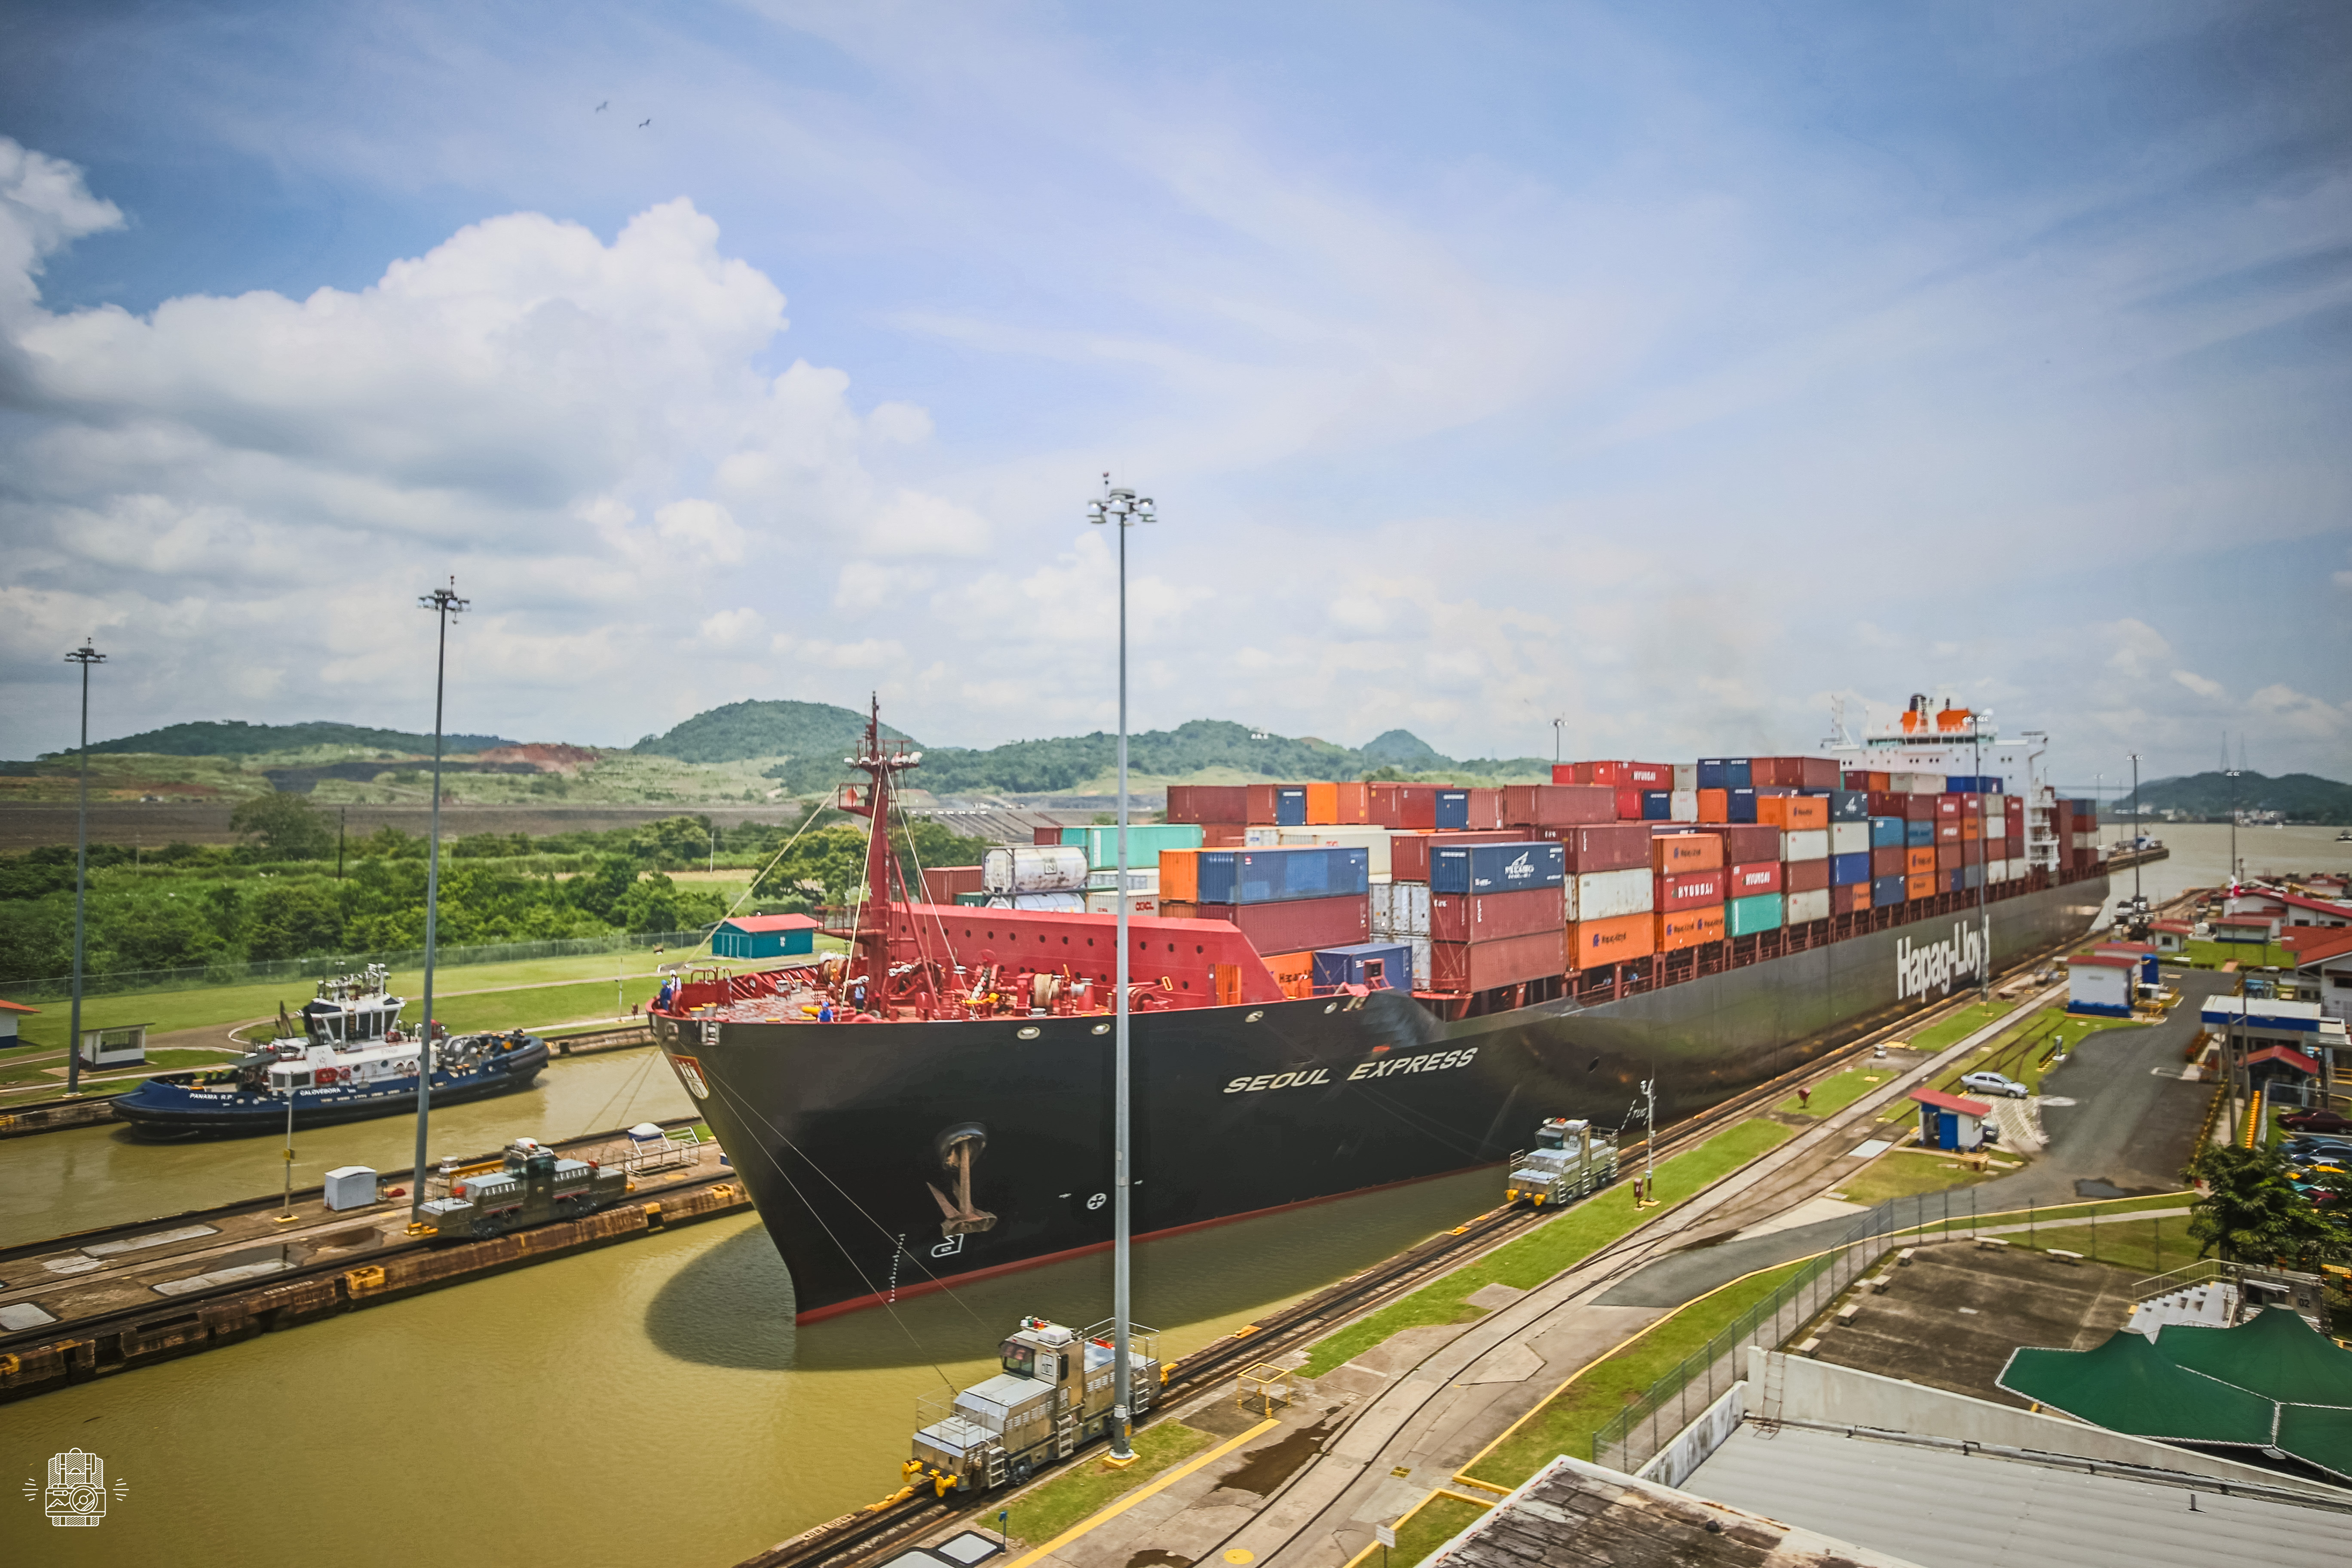 Panama/Canal de Panama